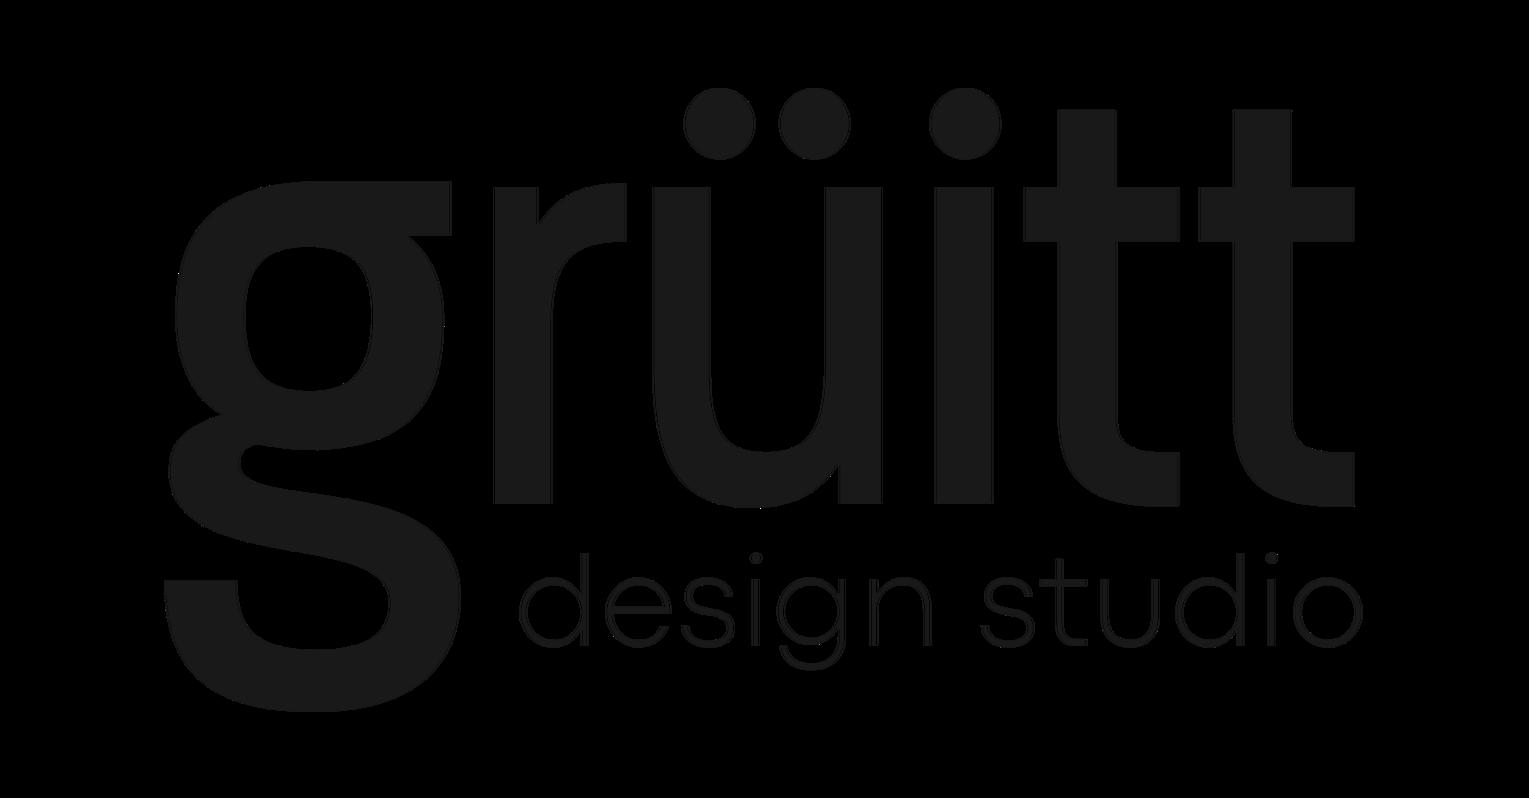 gruitt-design-studio